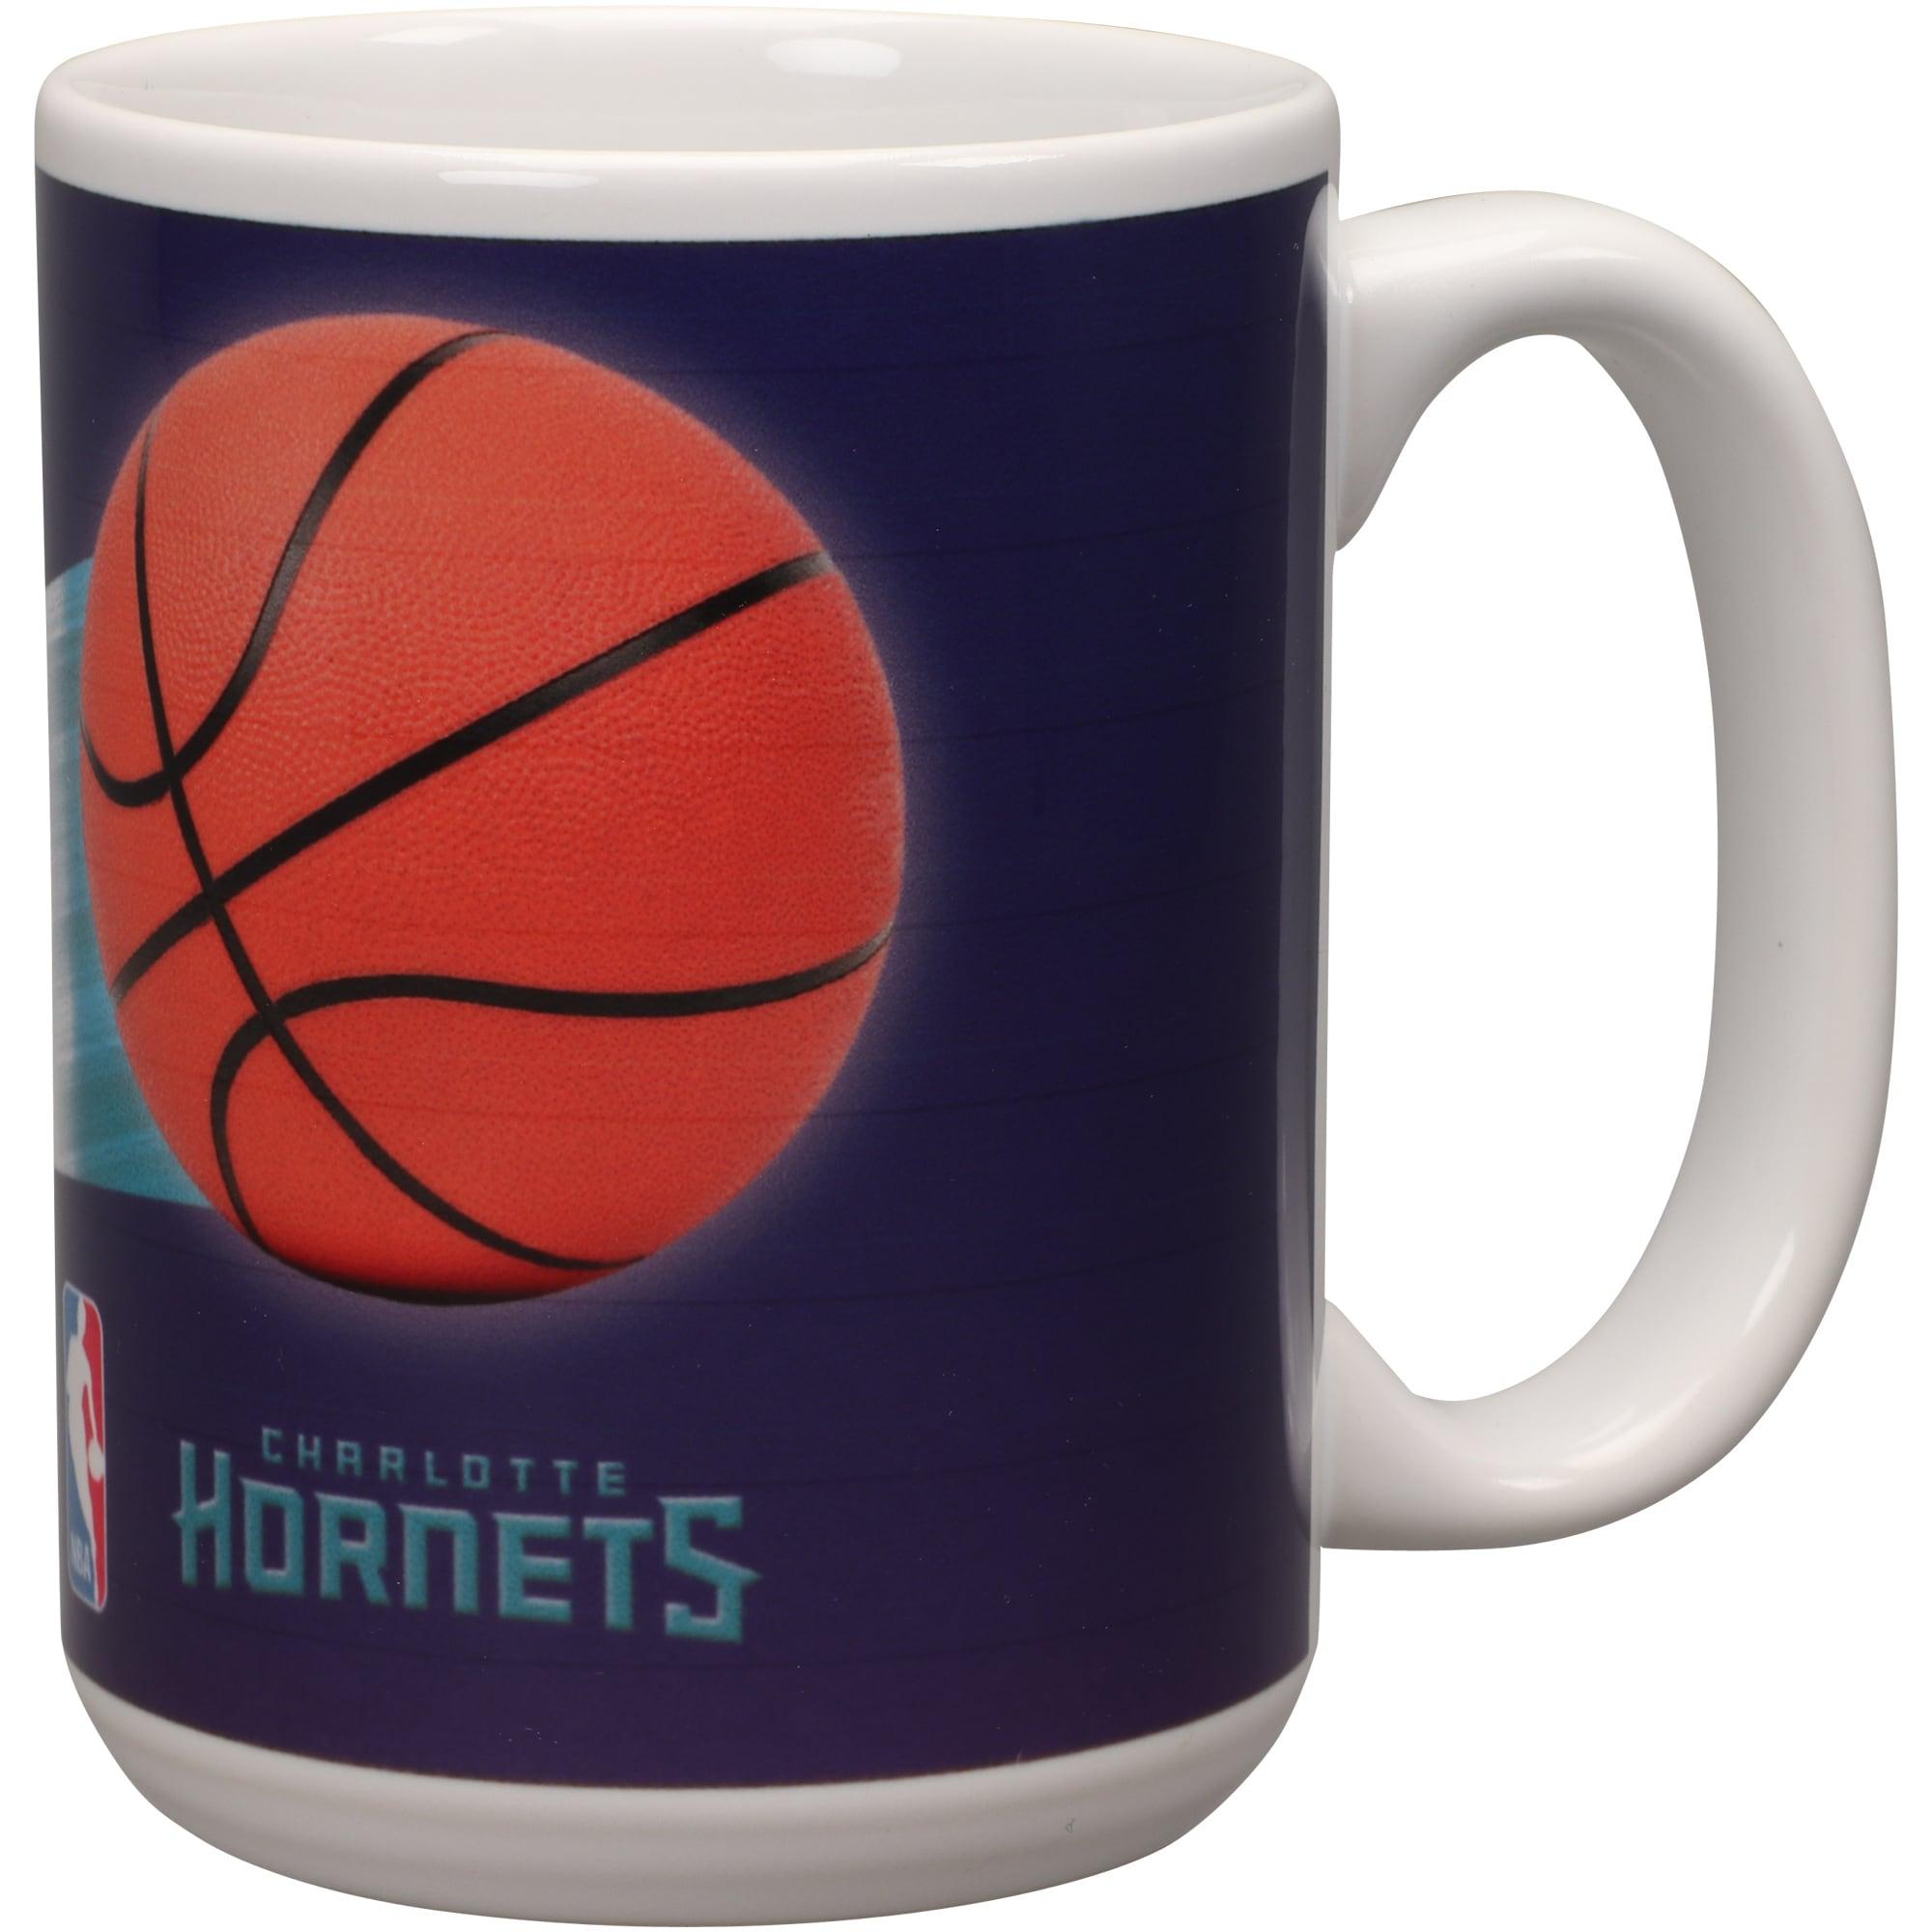 Charlotte Hornets 15oz. Team 3D Graphic Mug